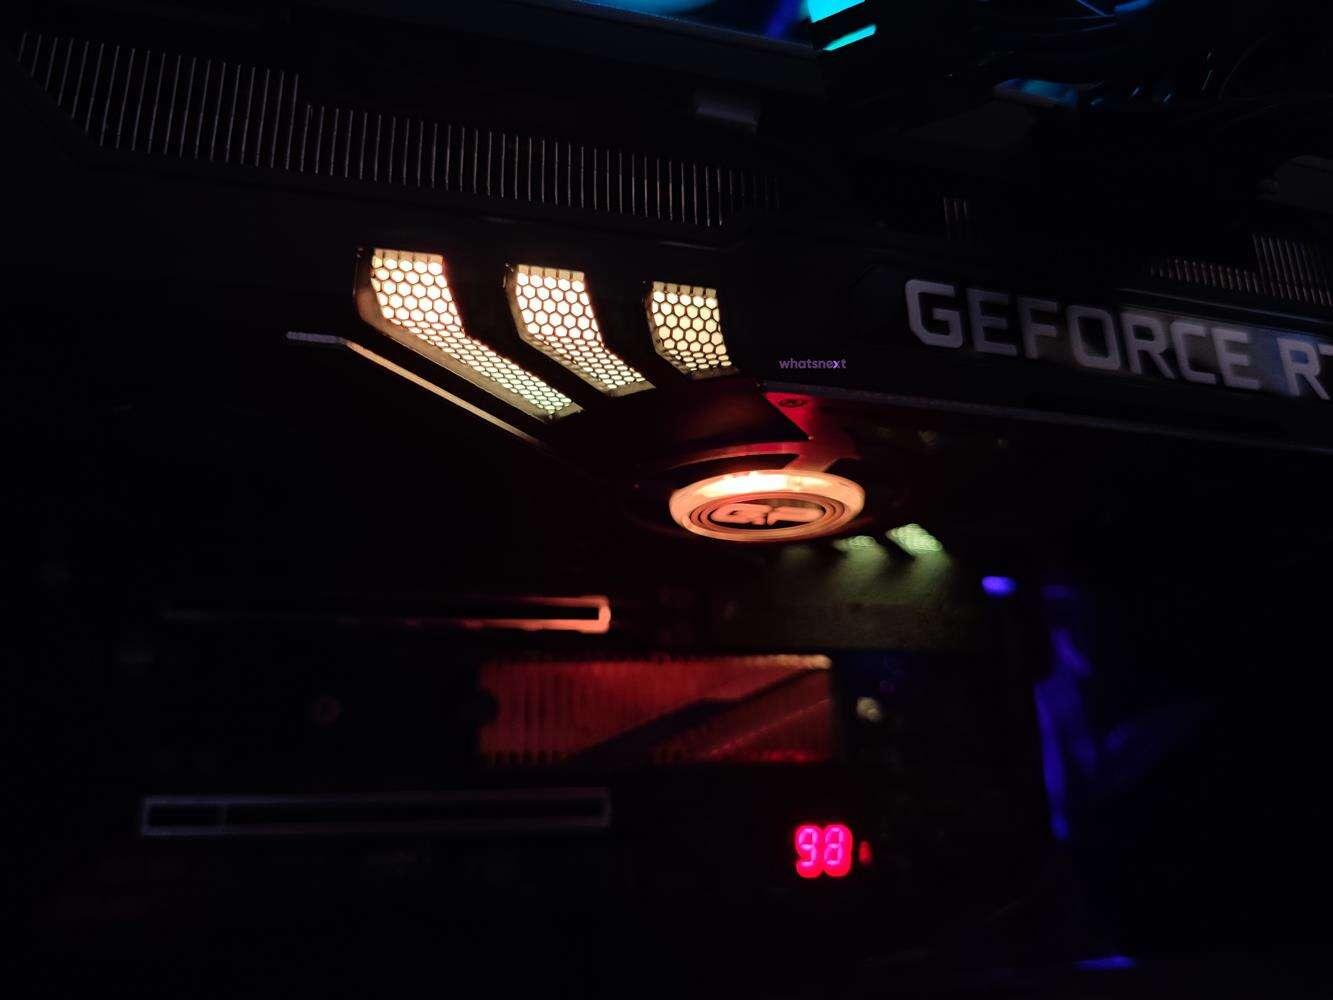 test Palit GeForce RTX 3080 Ti GamingPro, recenzja Palit GeForce RTX 3080 Ti GamingPro, opinia Palit GeForce RTX 3080 Ti GamingPro